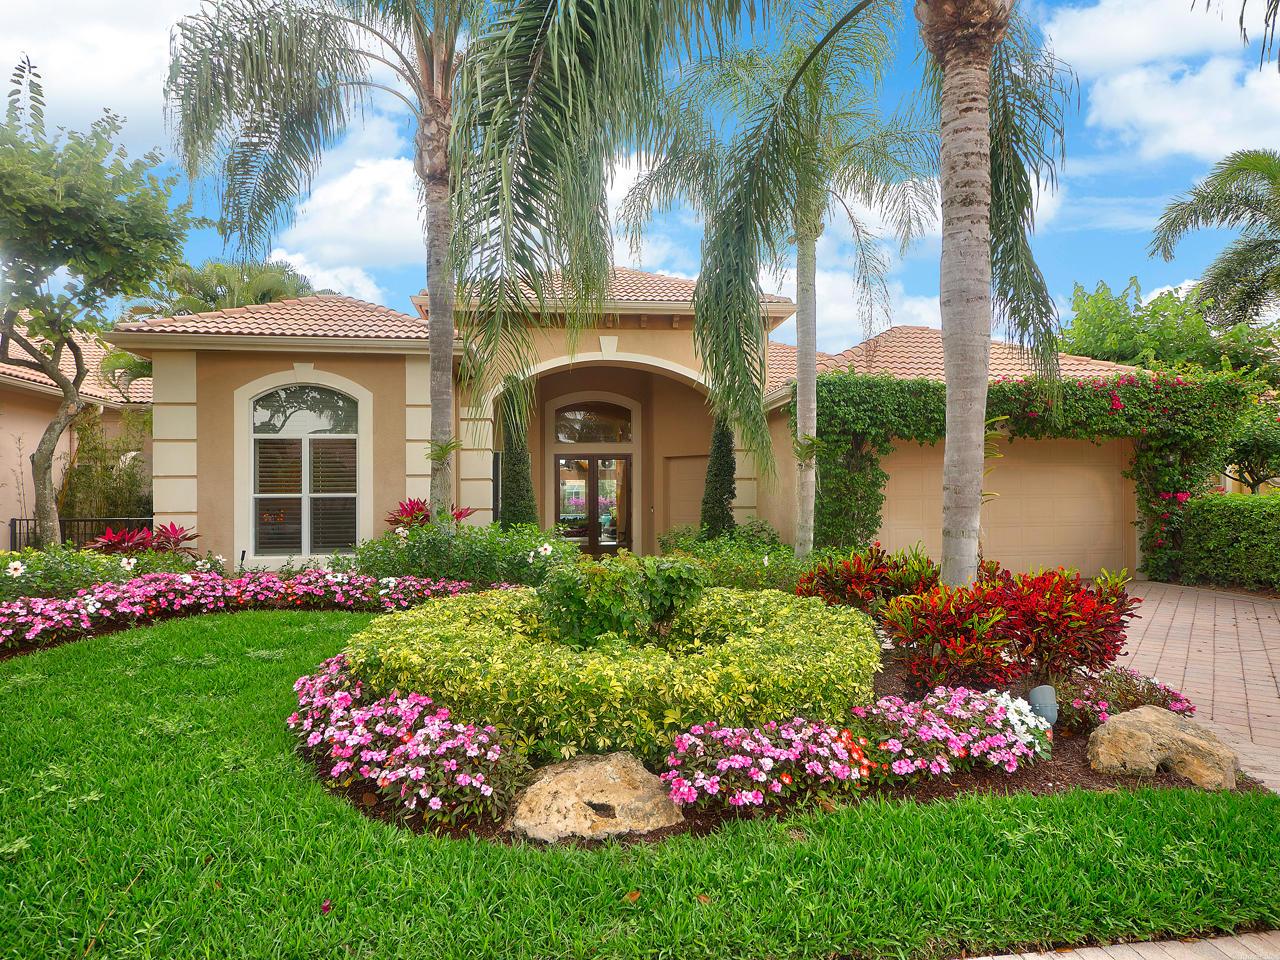 120 Vintage Isle, Palm Beach Gardens, Florida 33418, 3 Bedrooms Bedrooms, ,3 BathroomsBathrooms,A,Single family,Vintage Isle,RX-10506912